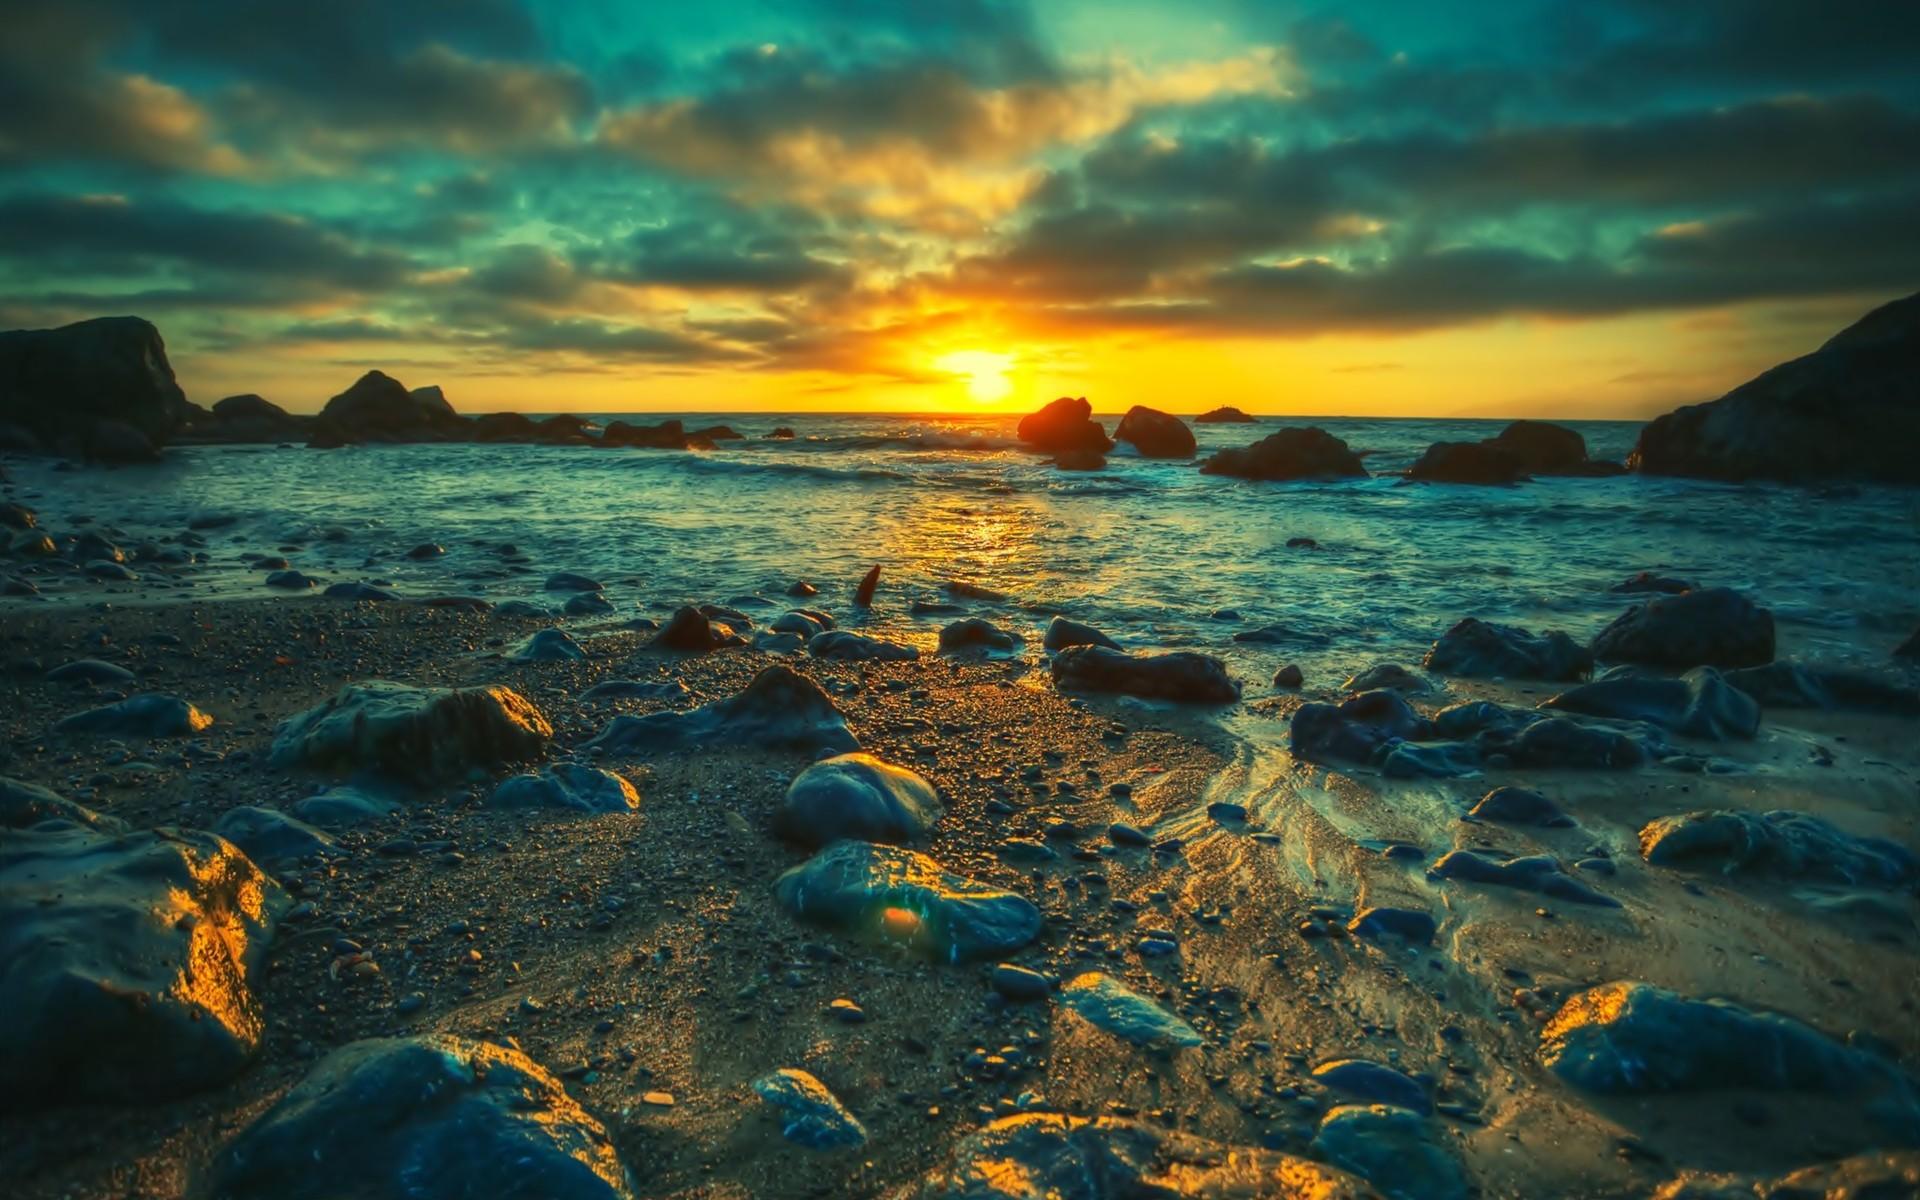 Sunset Landscapes Nature Sea 9854 Wallpaper Wallpaper hd 1920x1200